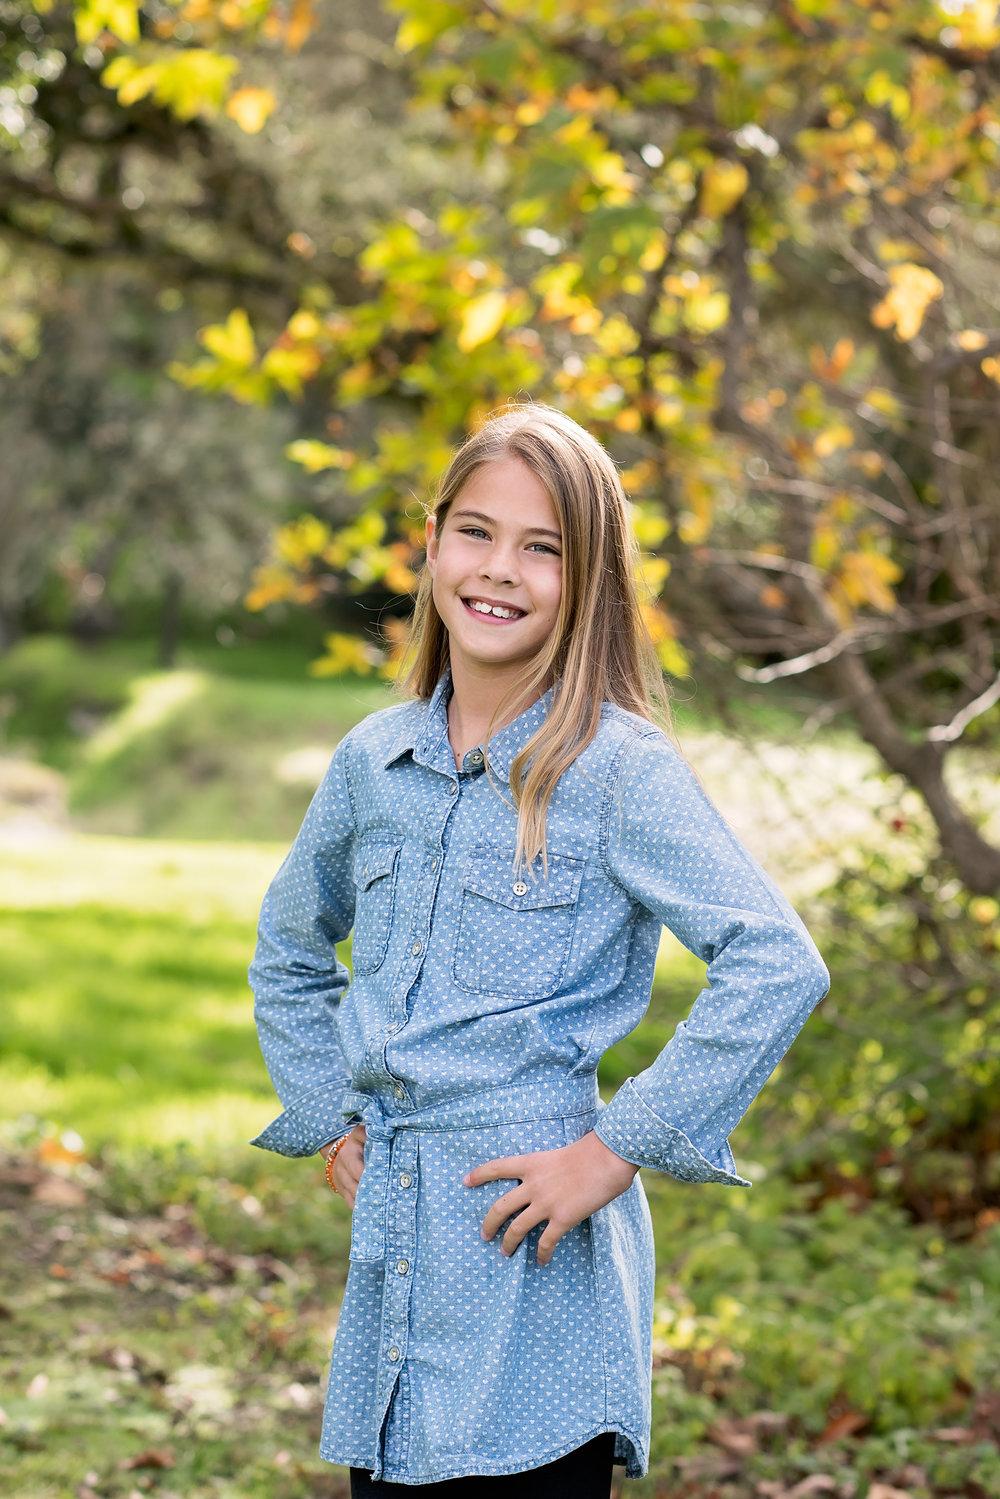 Central Coast Children's Photographer